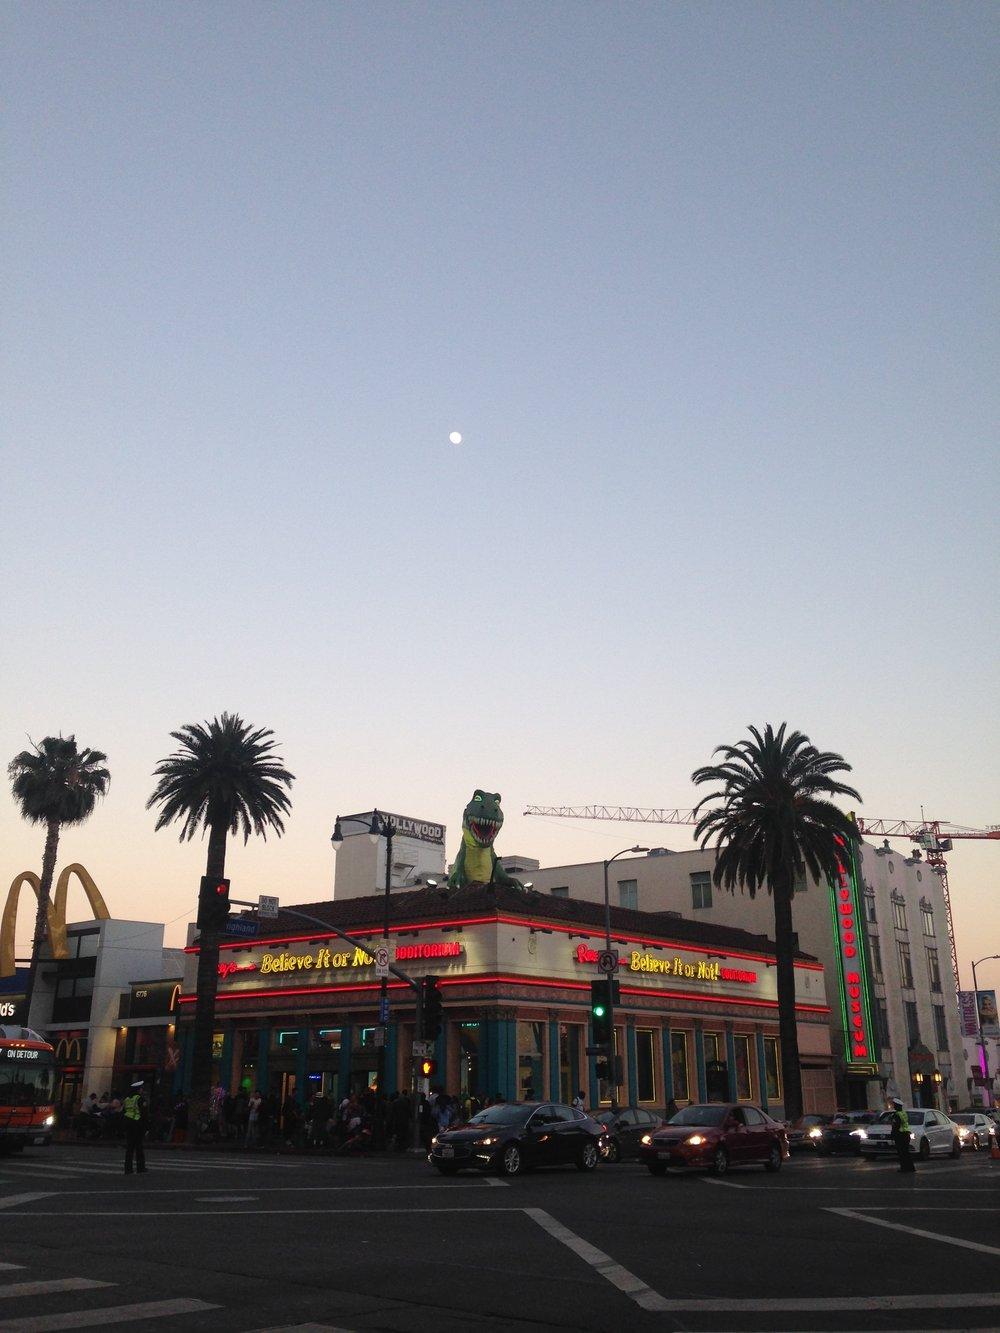 ^ Night sky over the Blvd